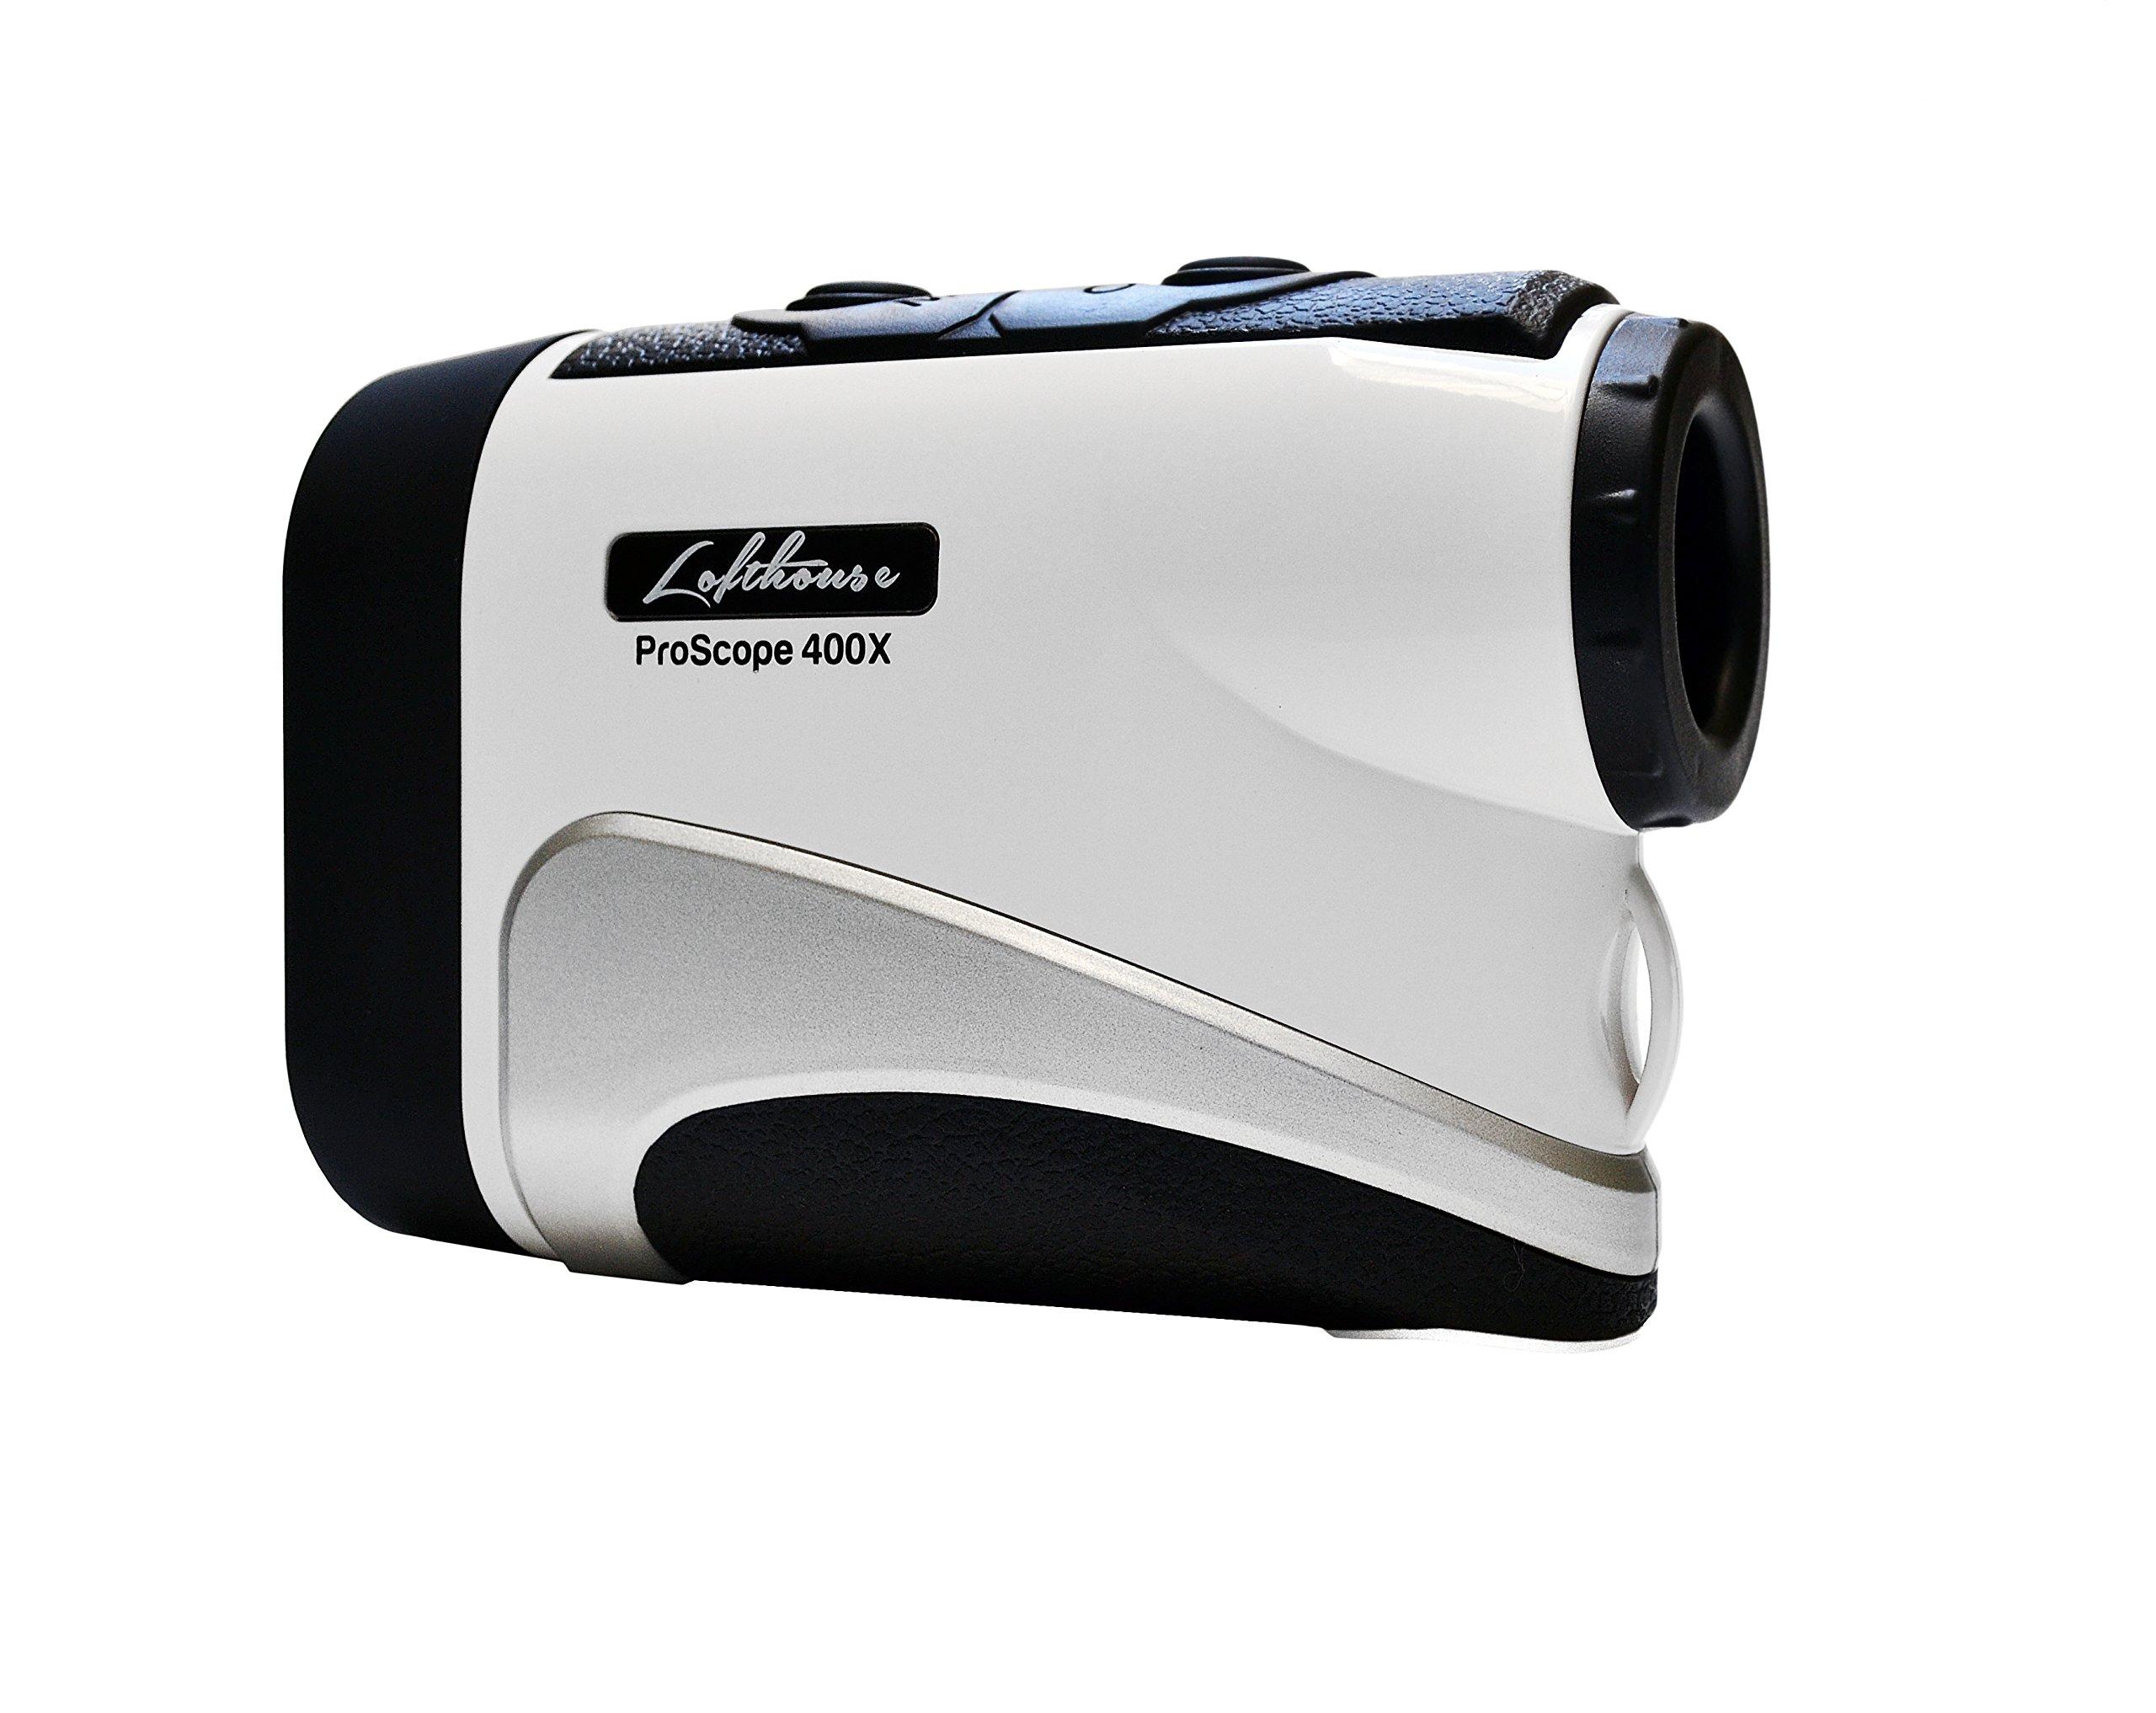 Lofthouse ProScope 400X Golf Rangefinder by Lofthouse Golf (Image #3)